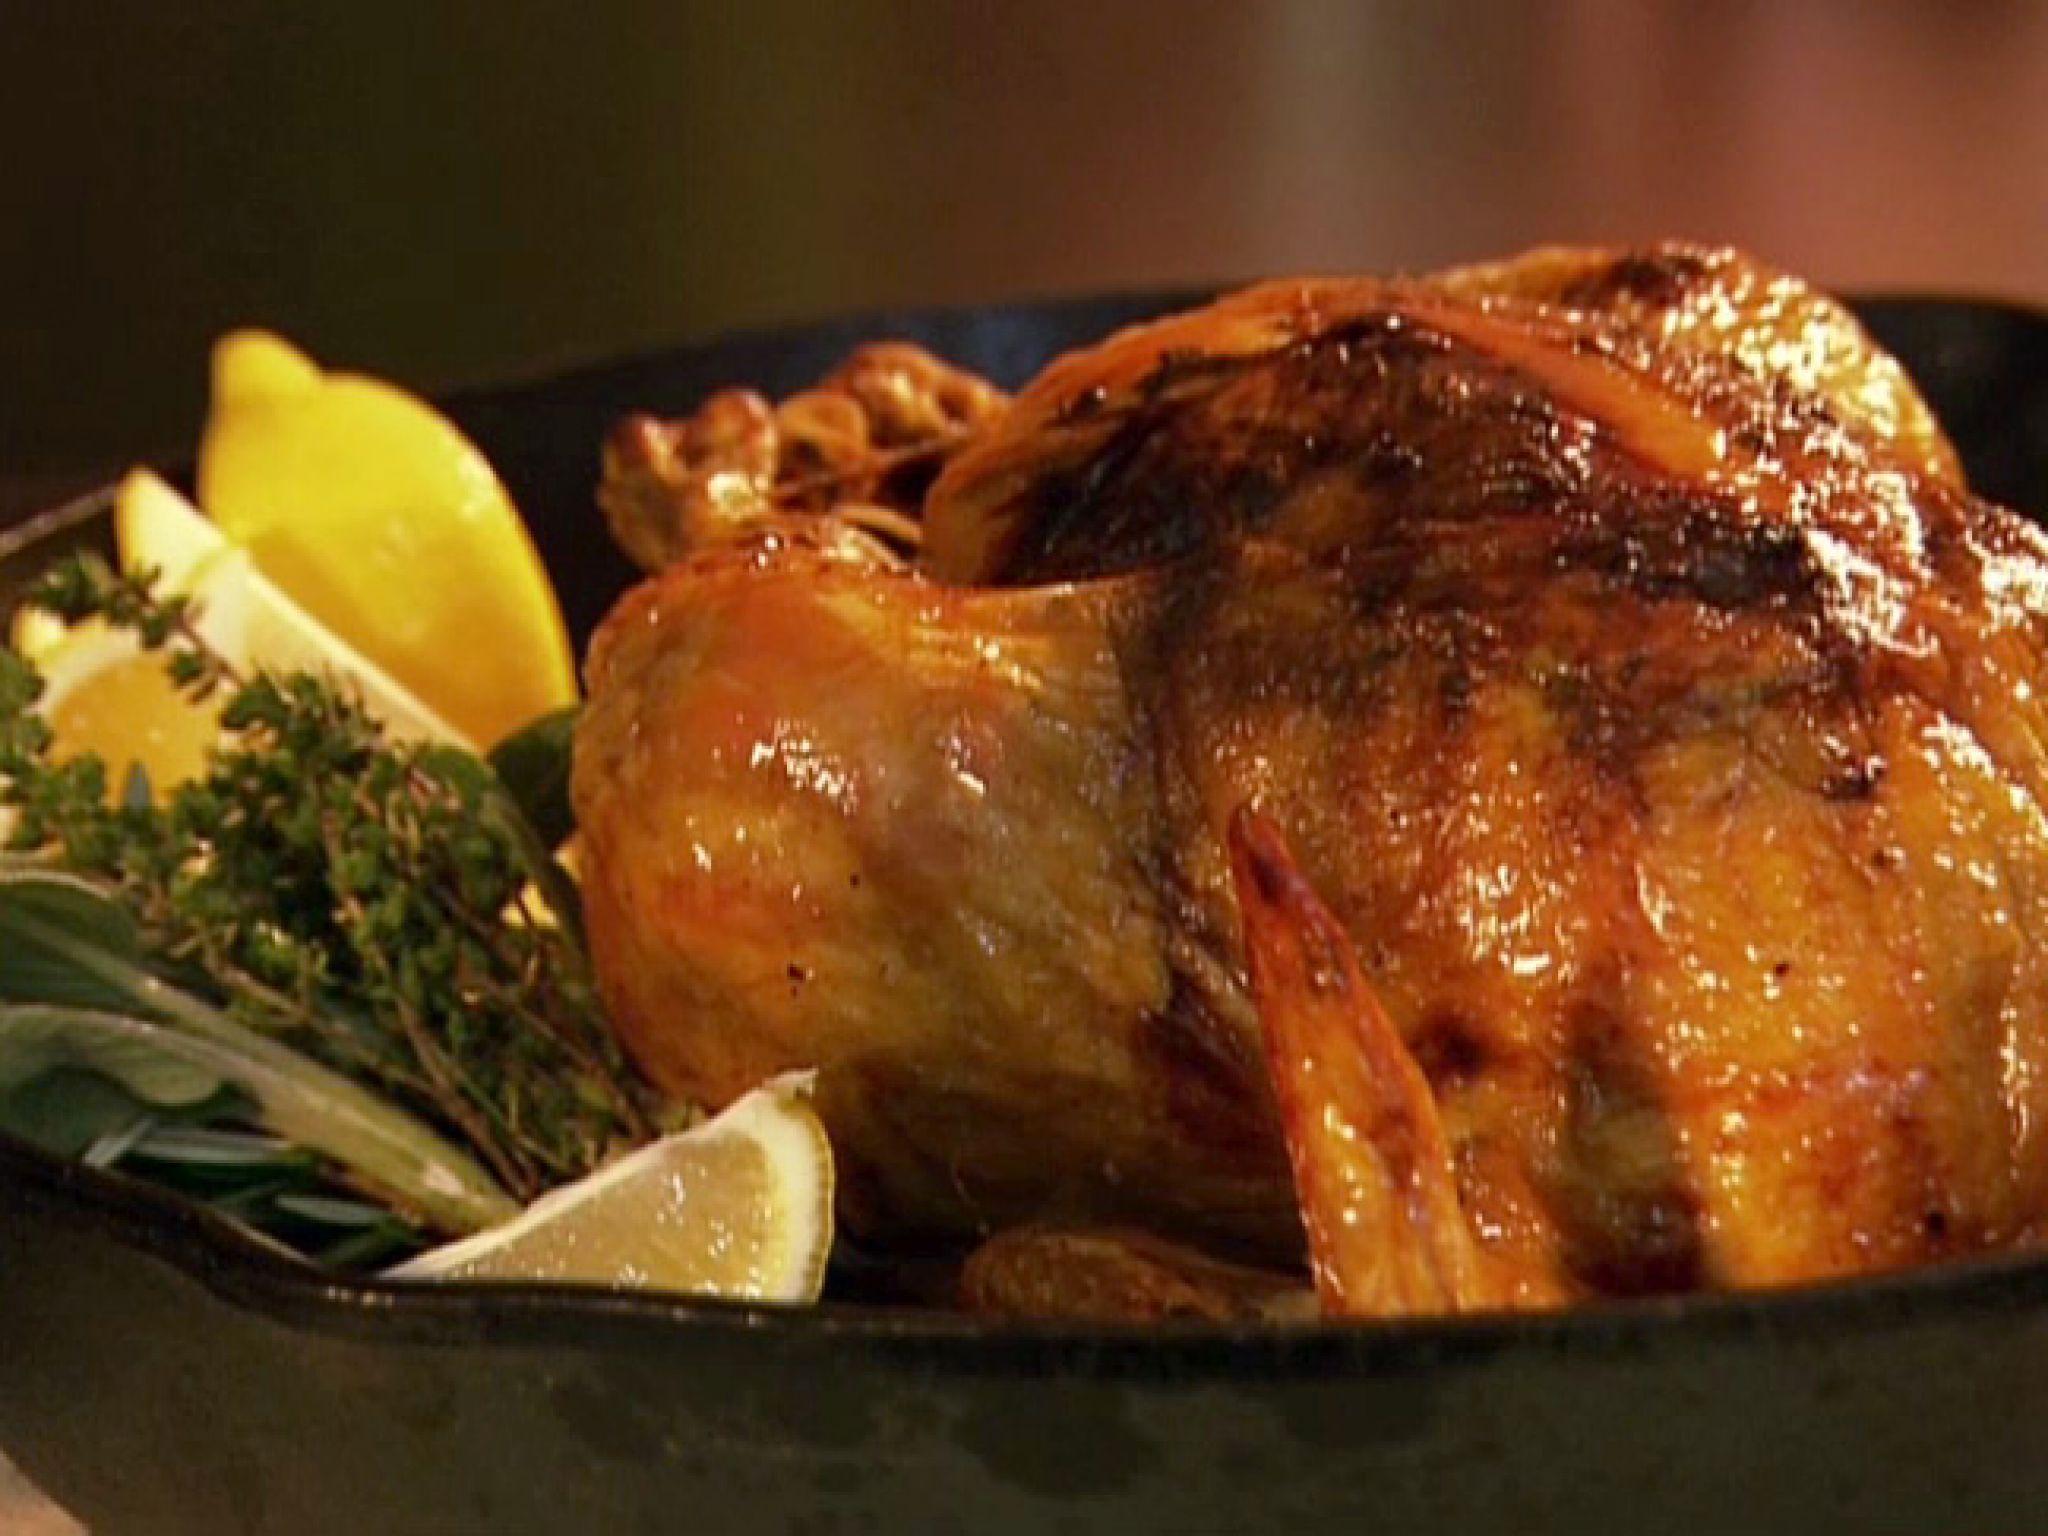 Ginas perfect roast chicken with gravy recipe perfect roast ginas perfect roast chicken with gravy forumfinder Images